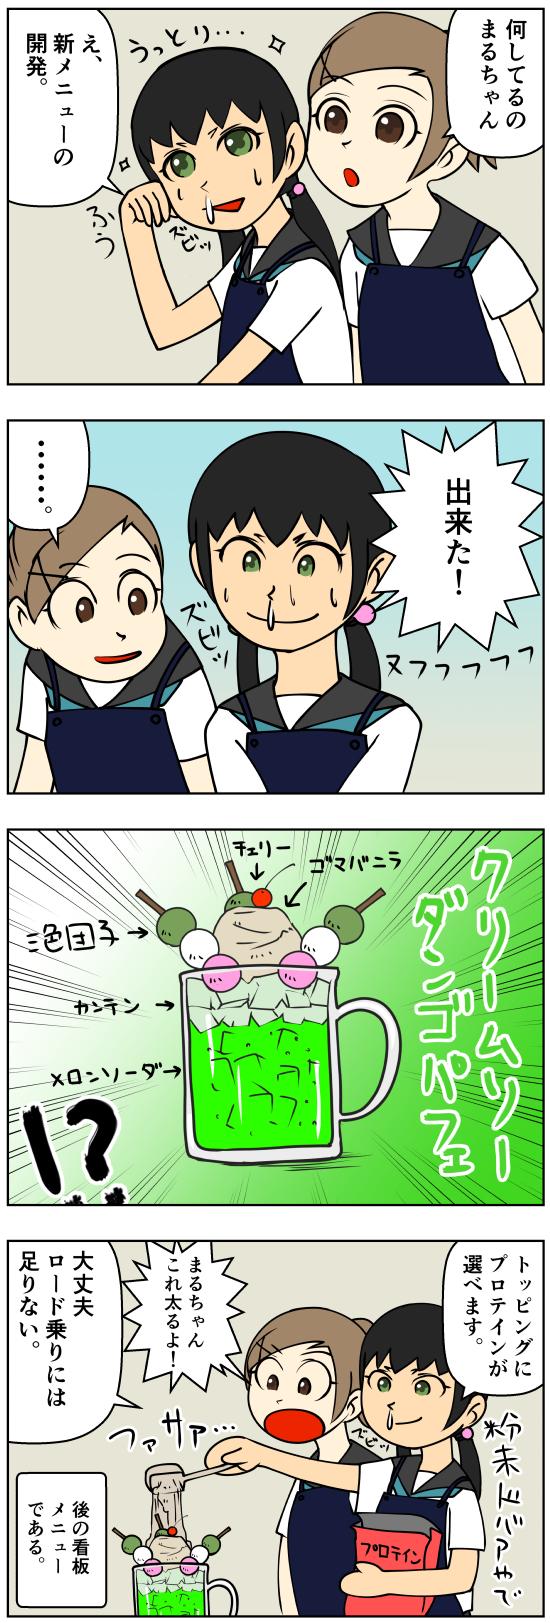 sansyokudanngochan-18-35a.jpg